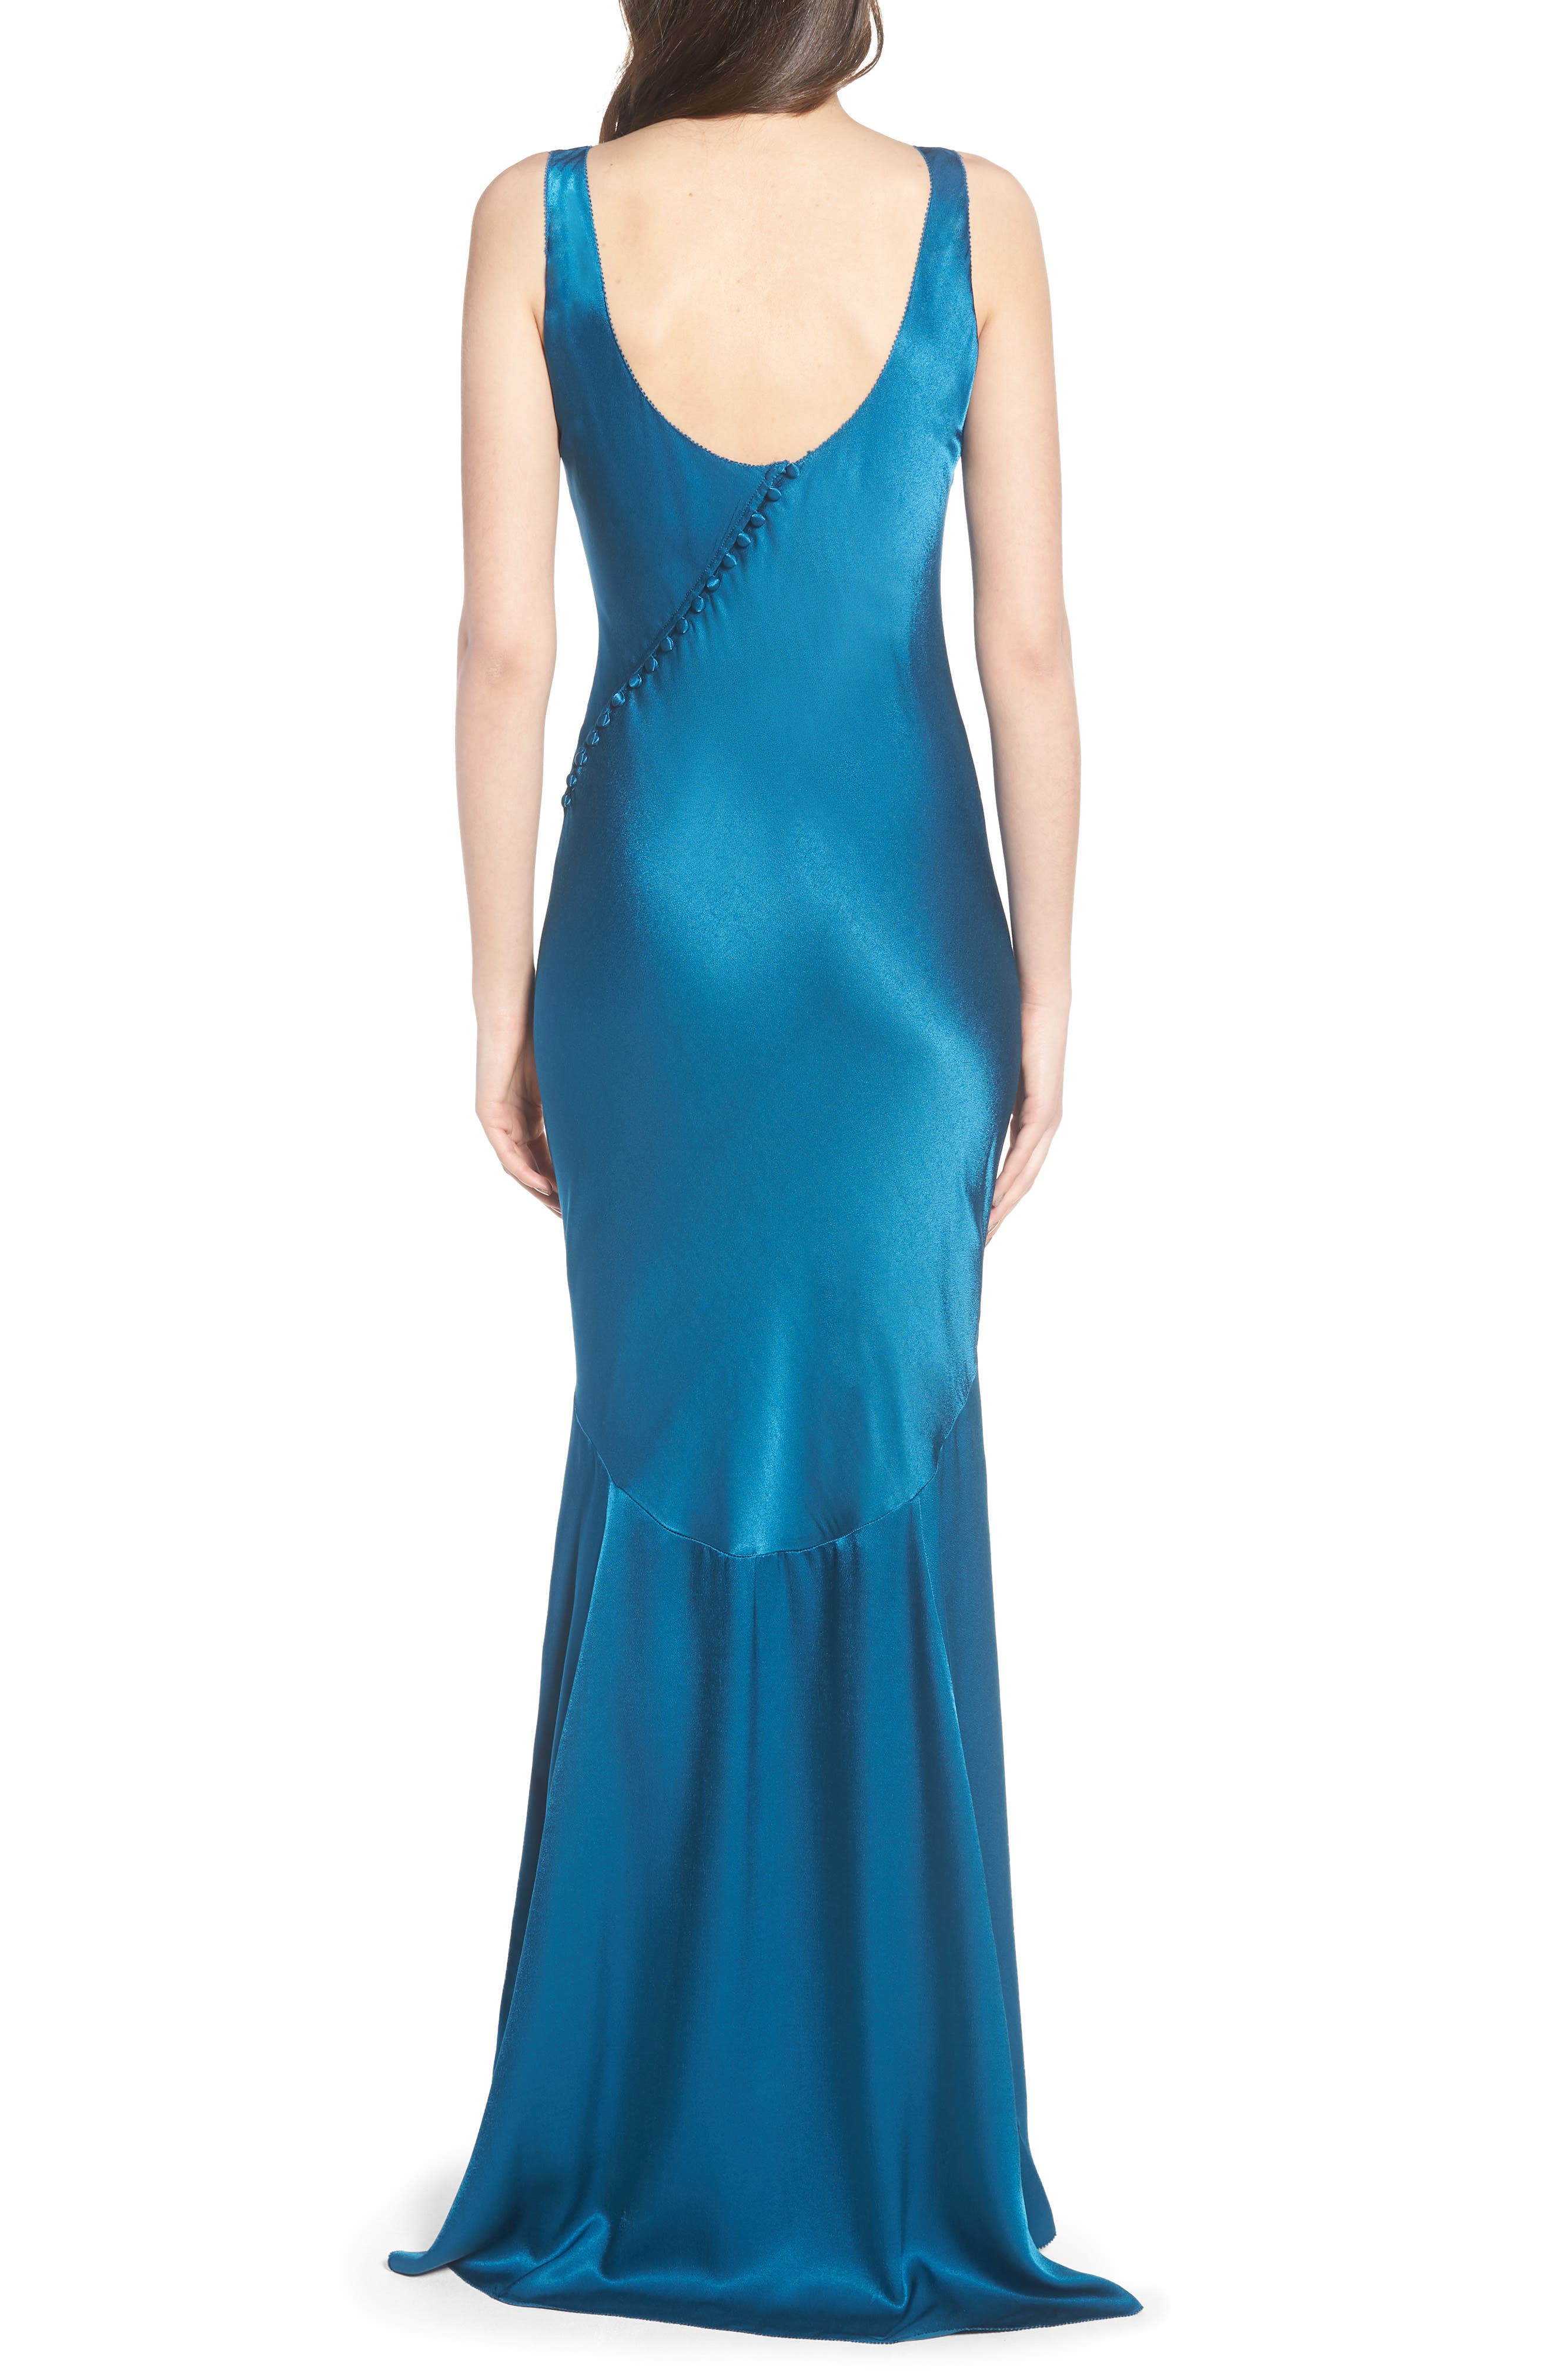 Cool Blondie Prom Dresses Images - Wedding Ideas - memiocall.com